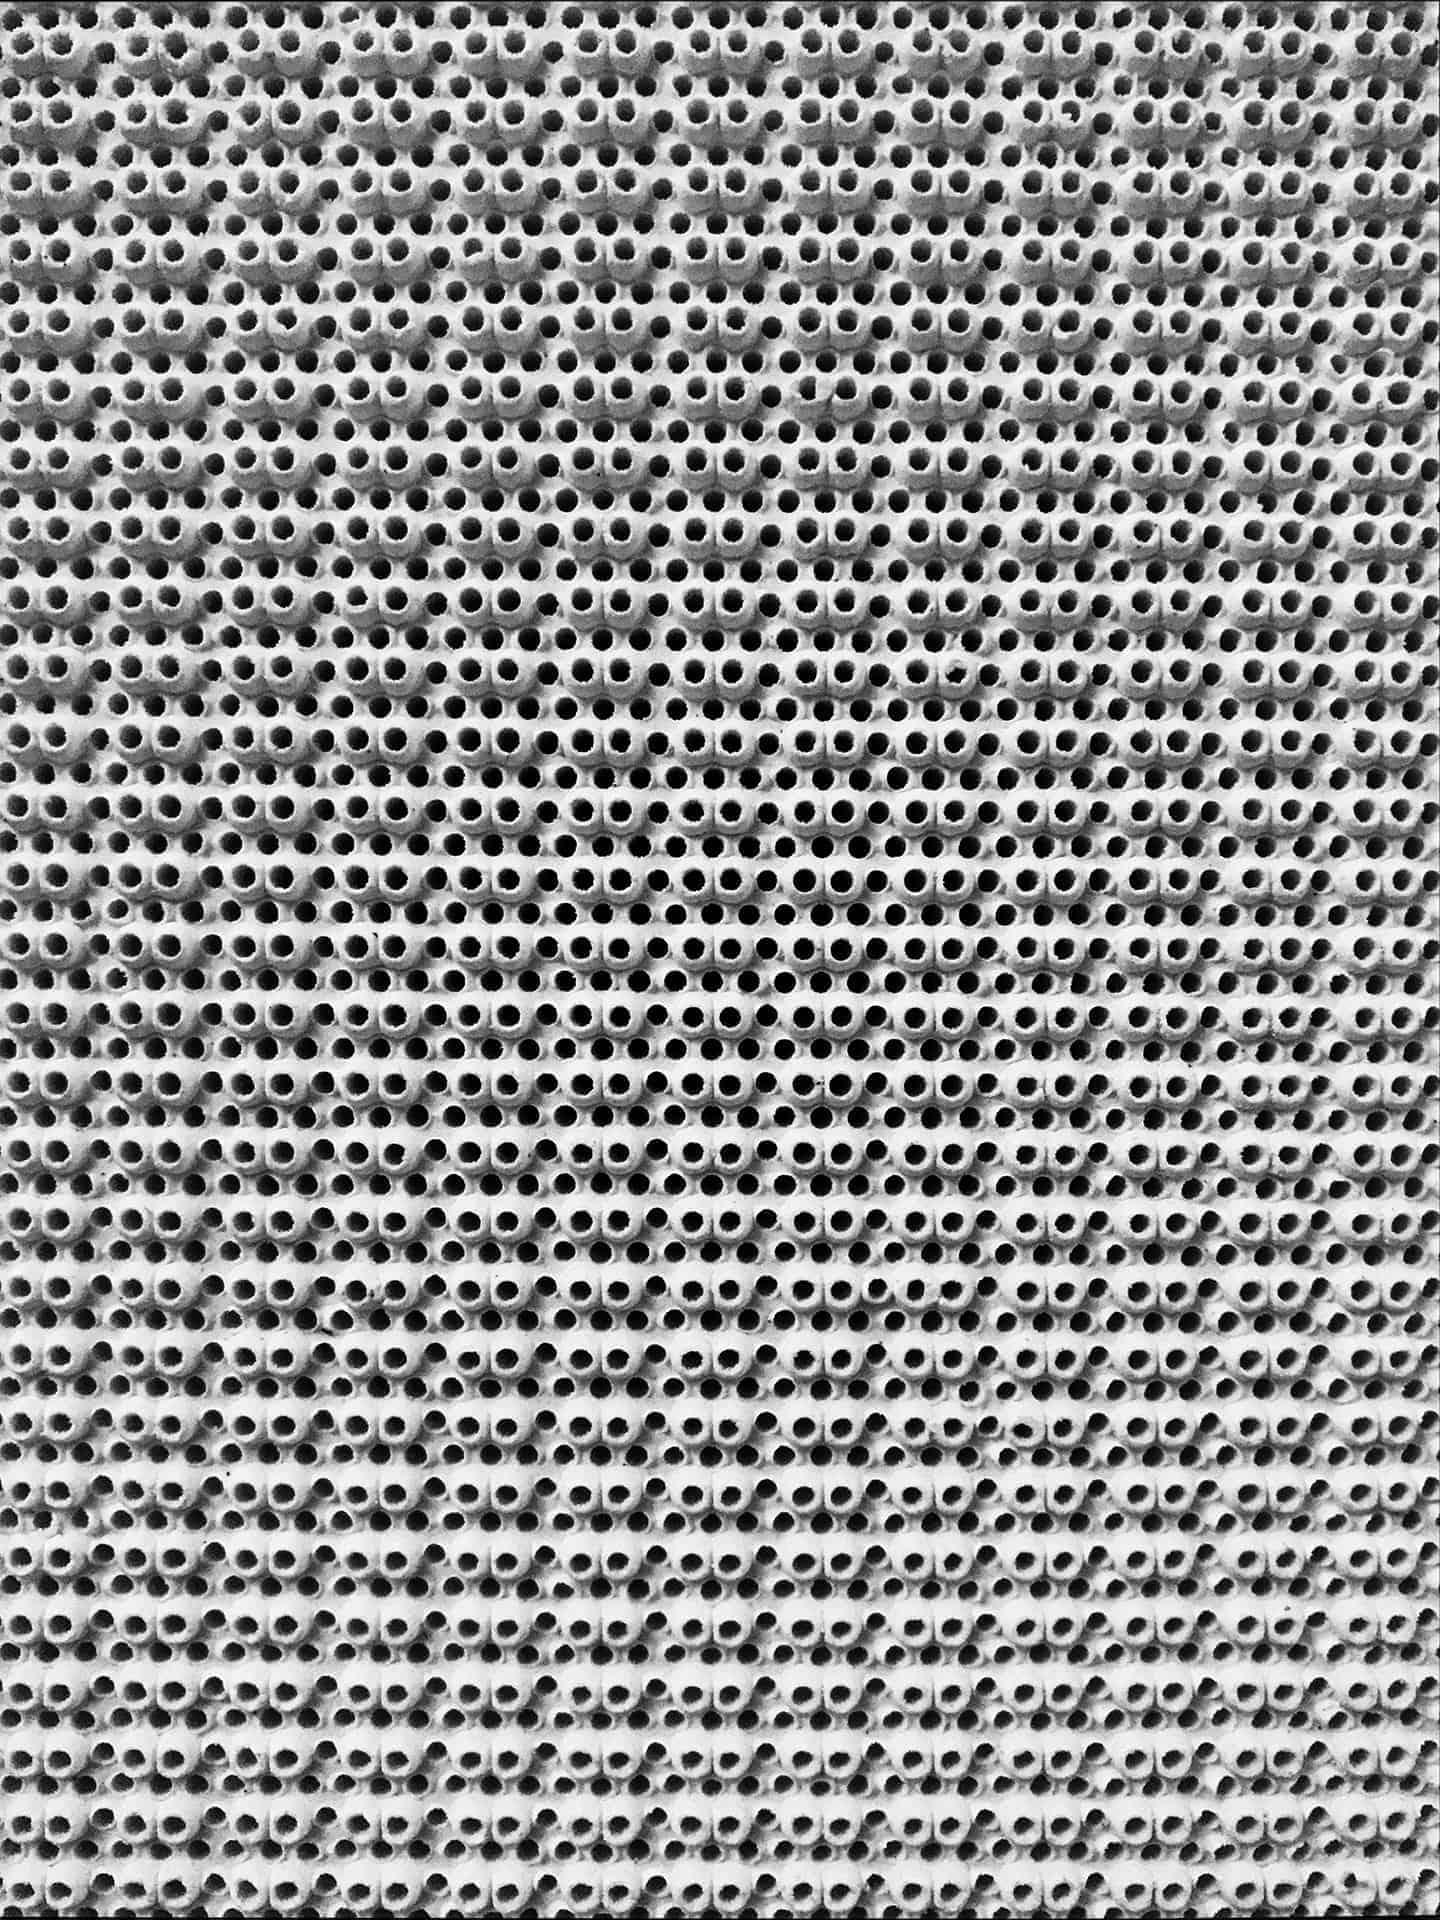 artnorama - Filter Sieve